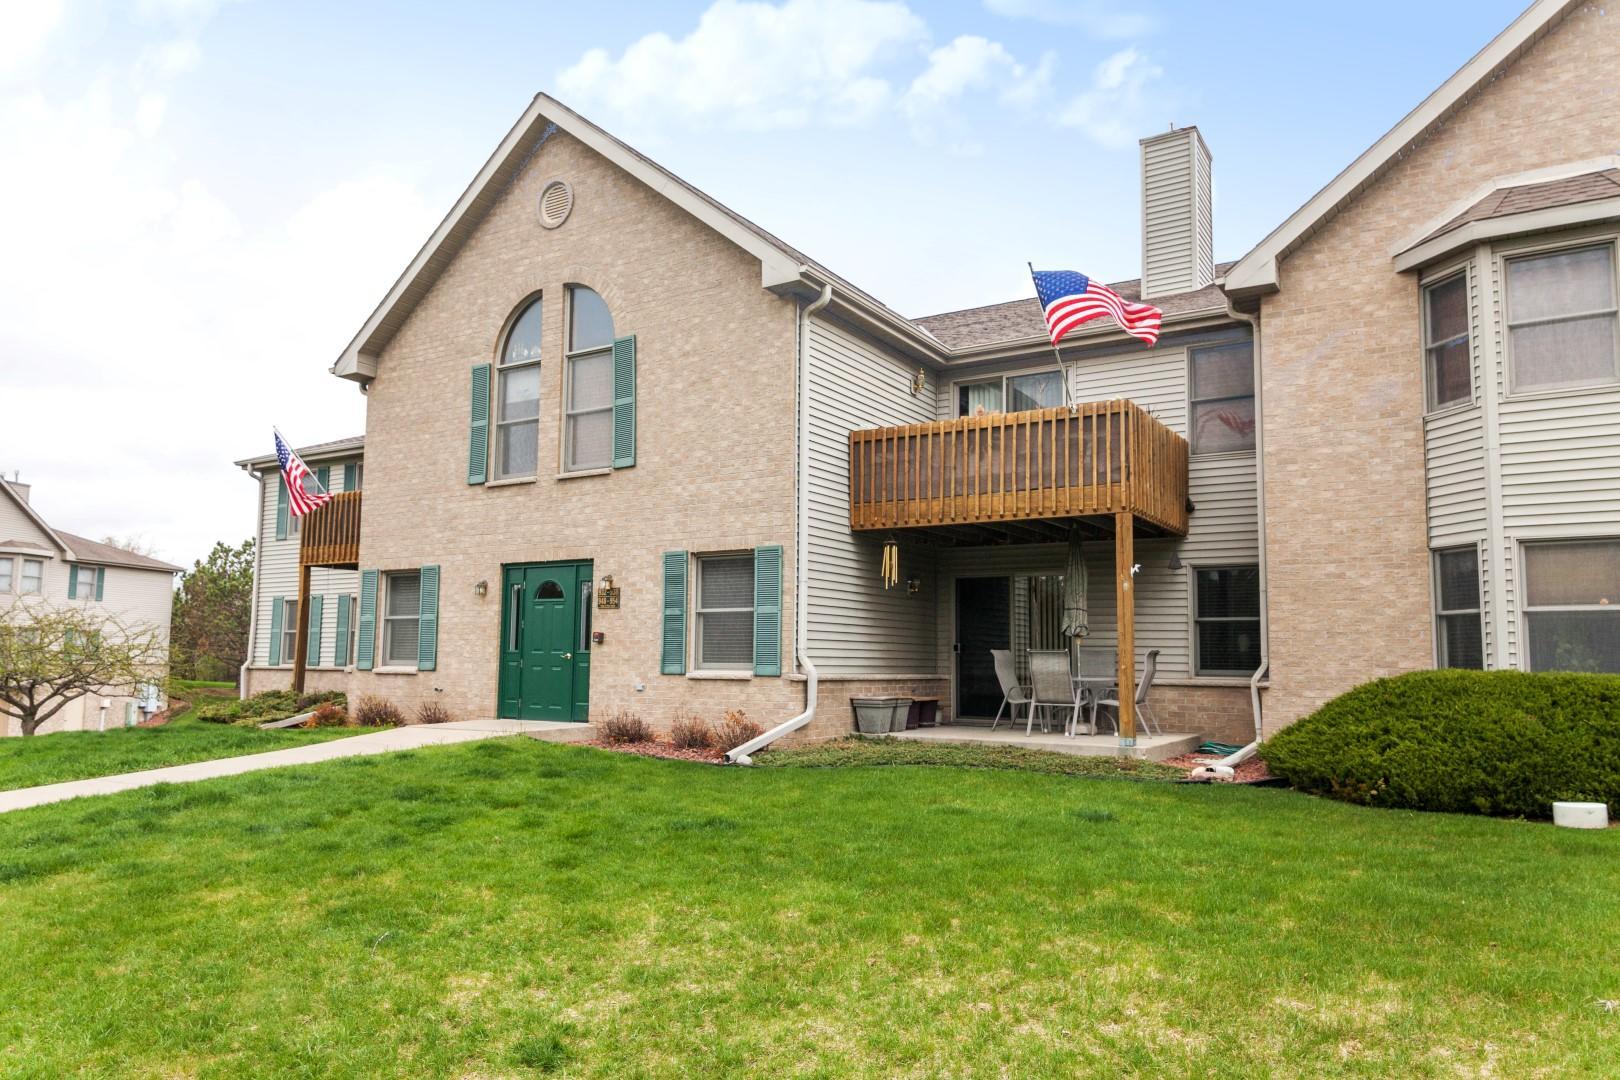 936 Oconomowoc Pkwy, Oconomowoc, Wisconsin 53066, 3 Bedrooms Bedrooms, 7 Rooms Rooms,2 BathroomsBathrooms,Condominiums,For Sale,Oconomowoc Pkwy,2,1735113